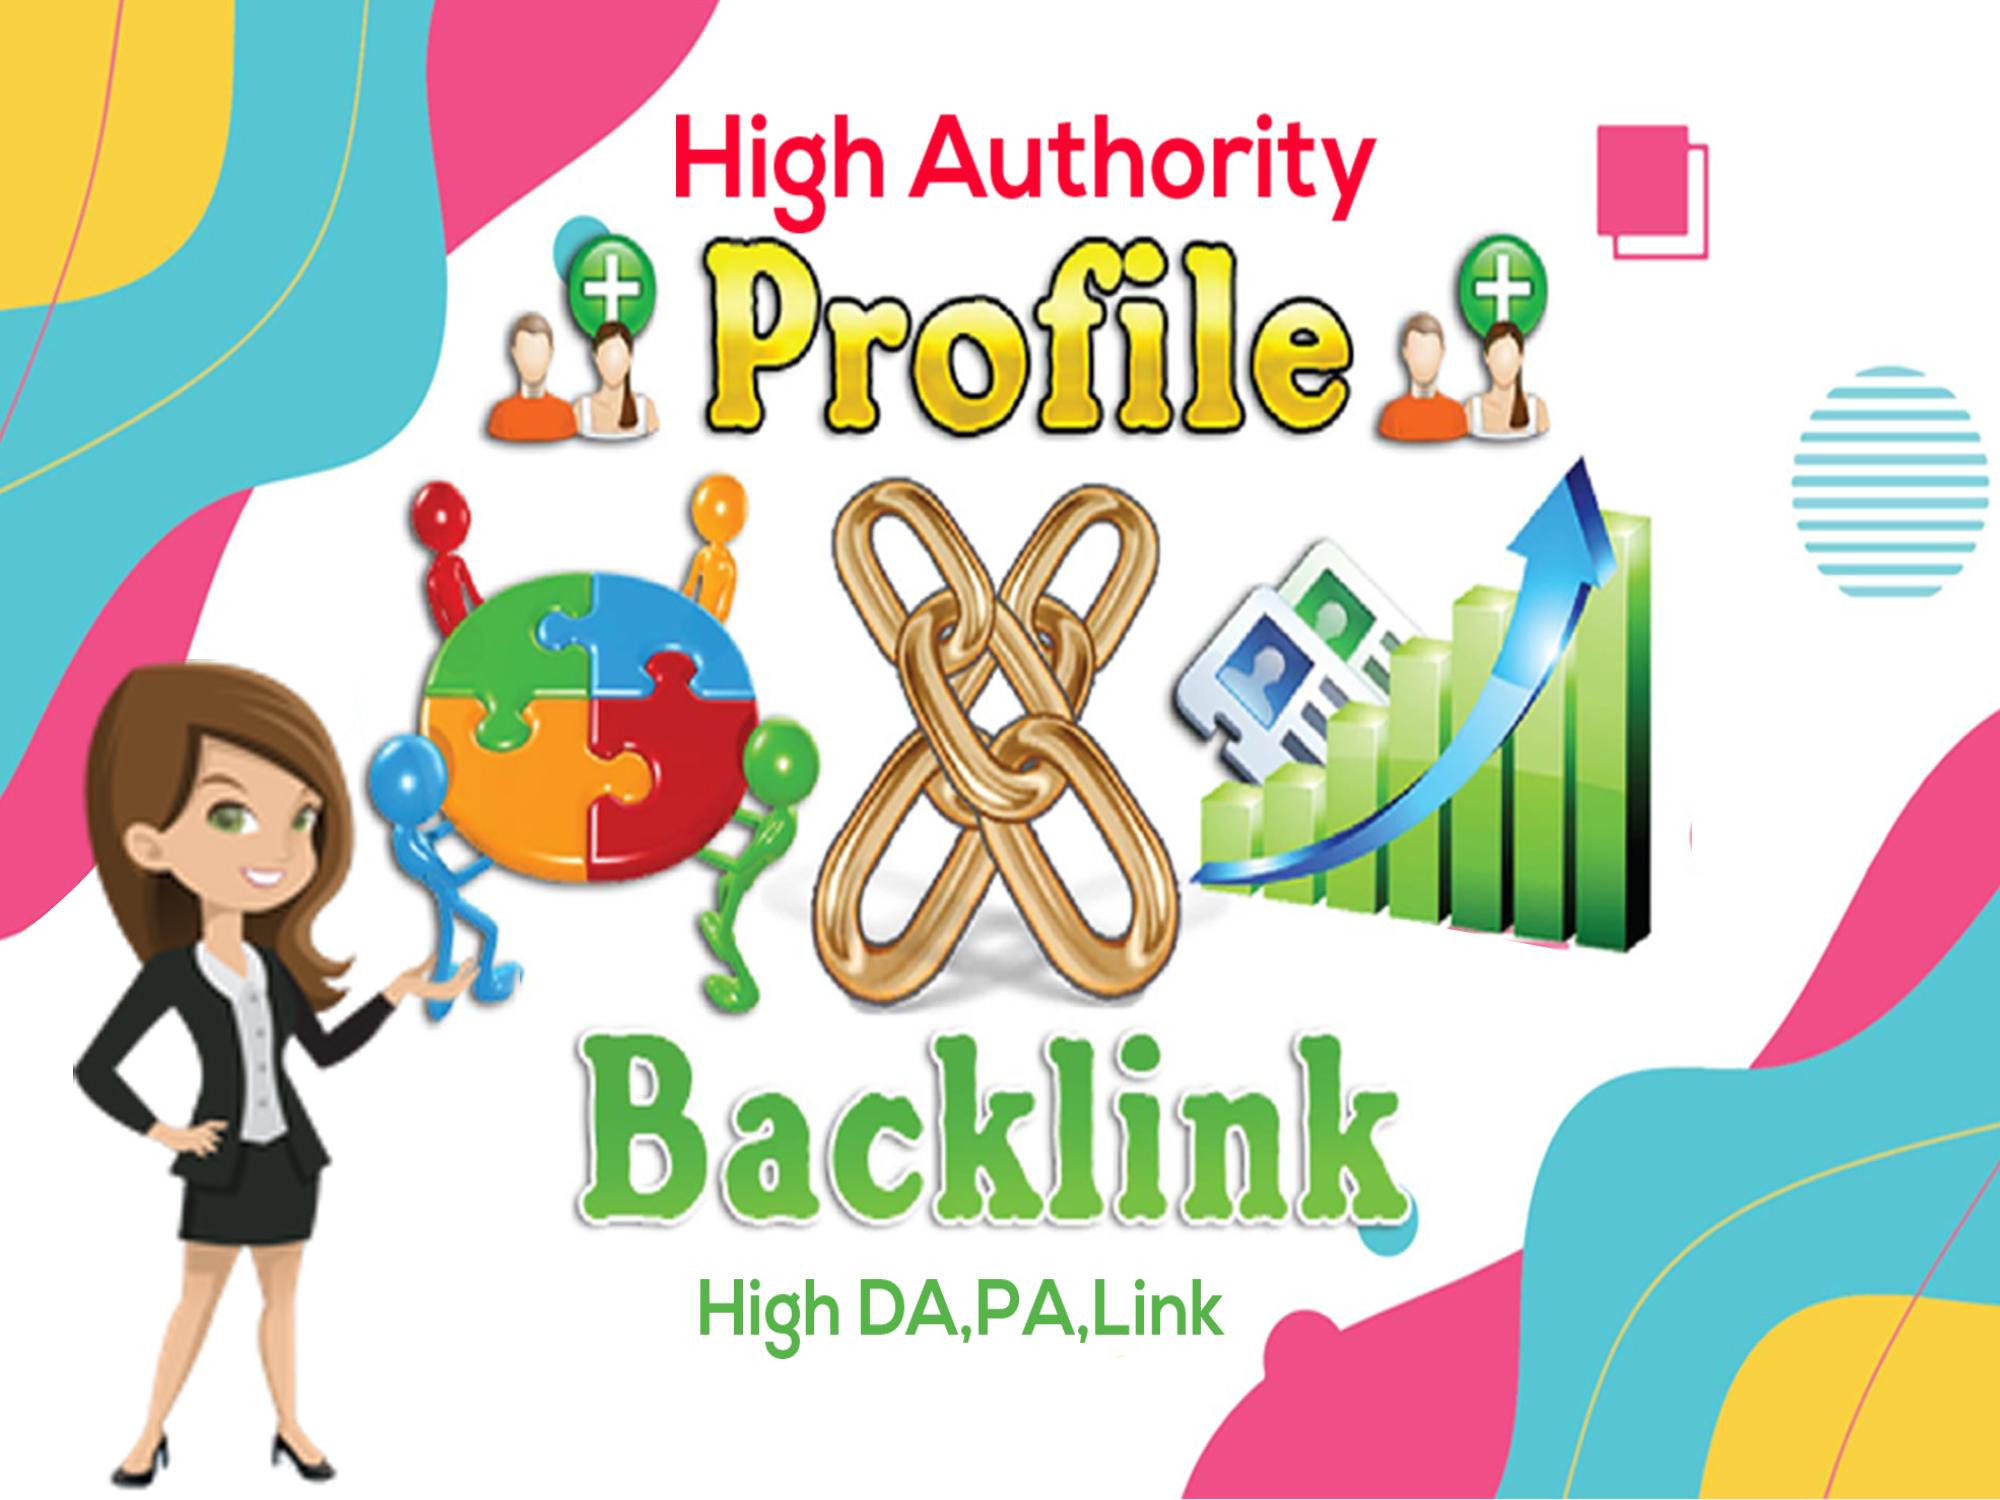 I will create 250 SEO profile backlinks on high authority websites